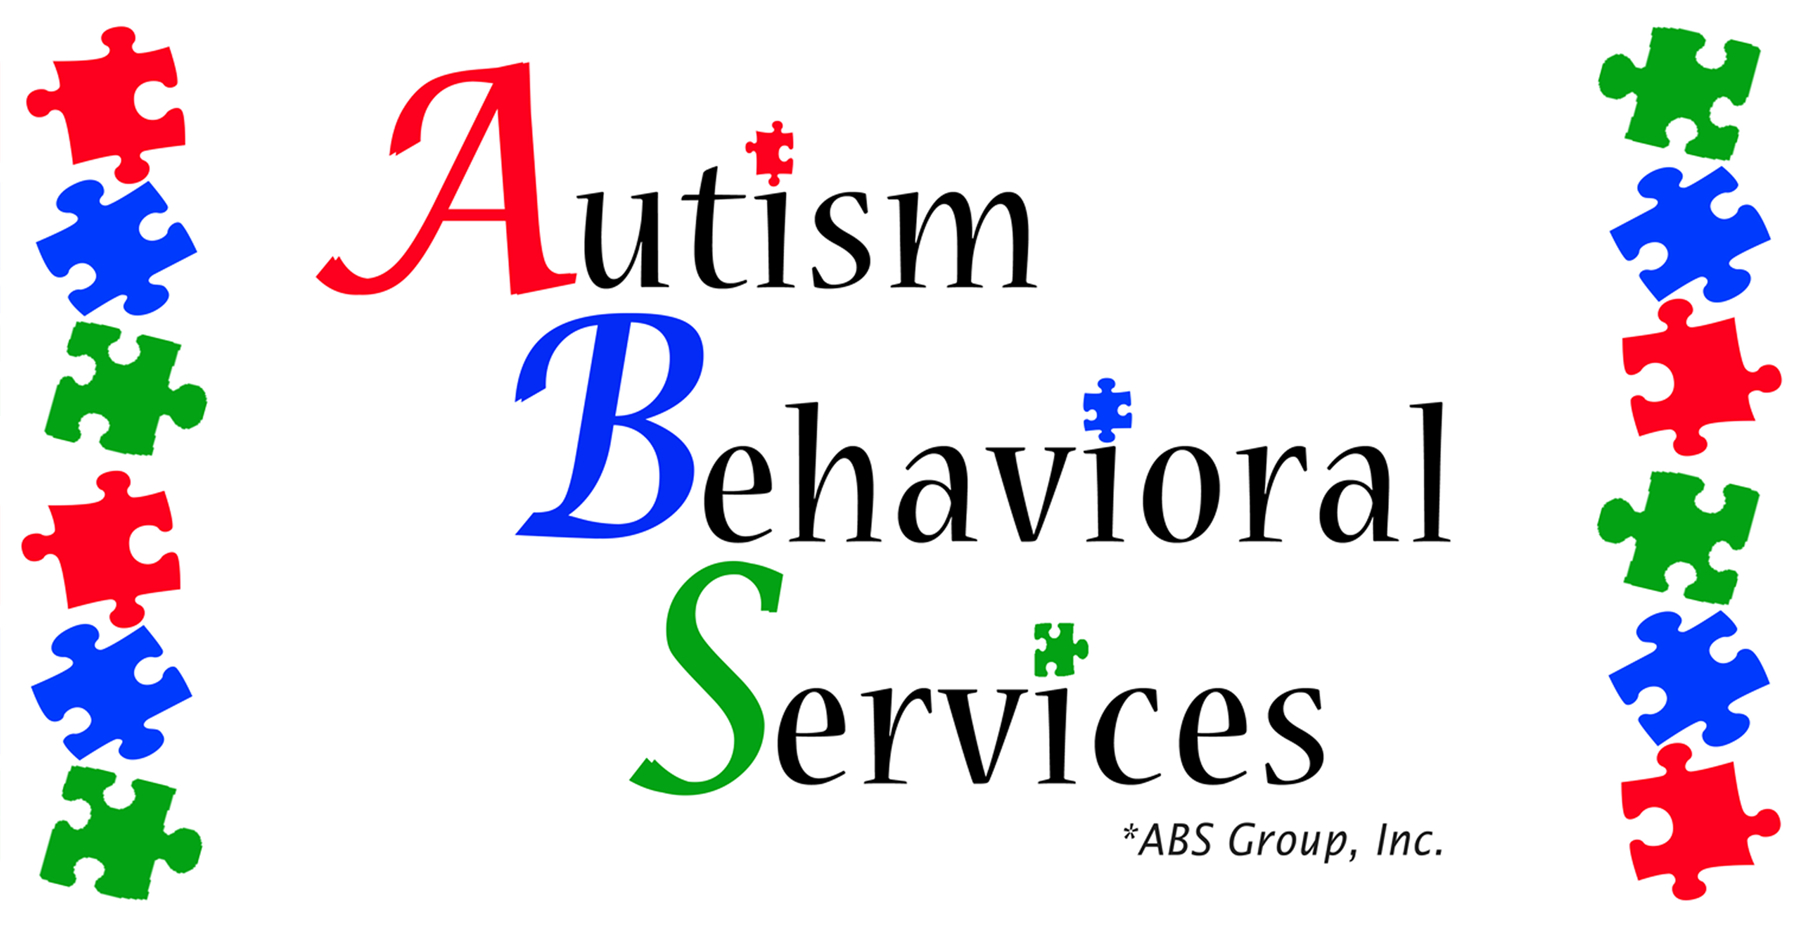 Autism Behavioral Services, ABS Group, Inc